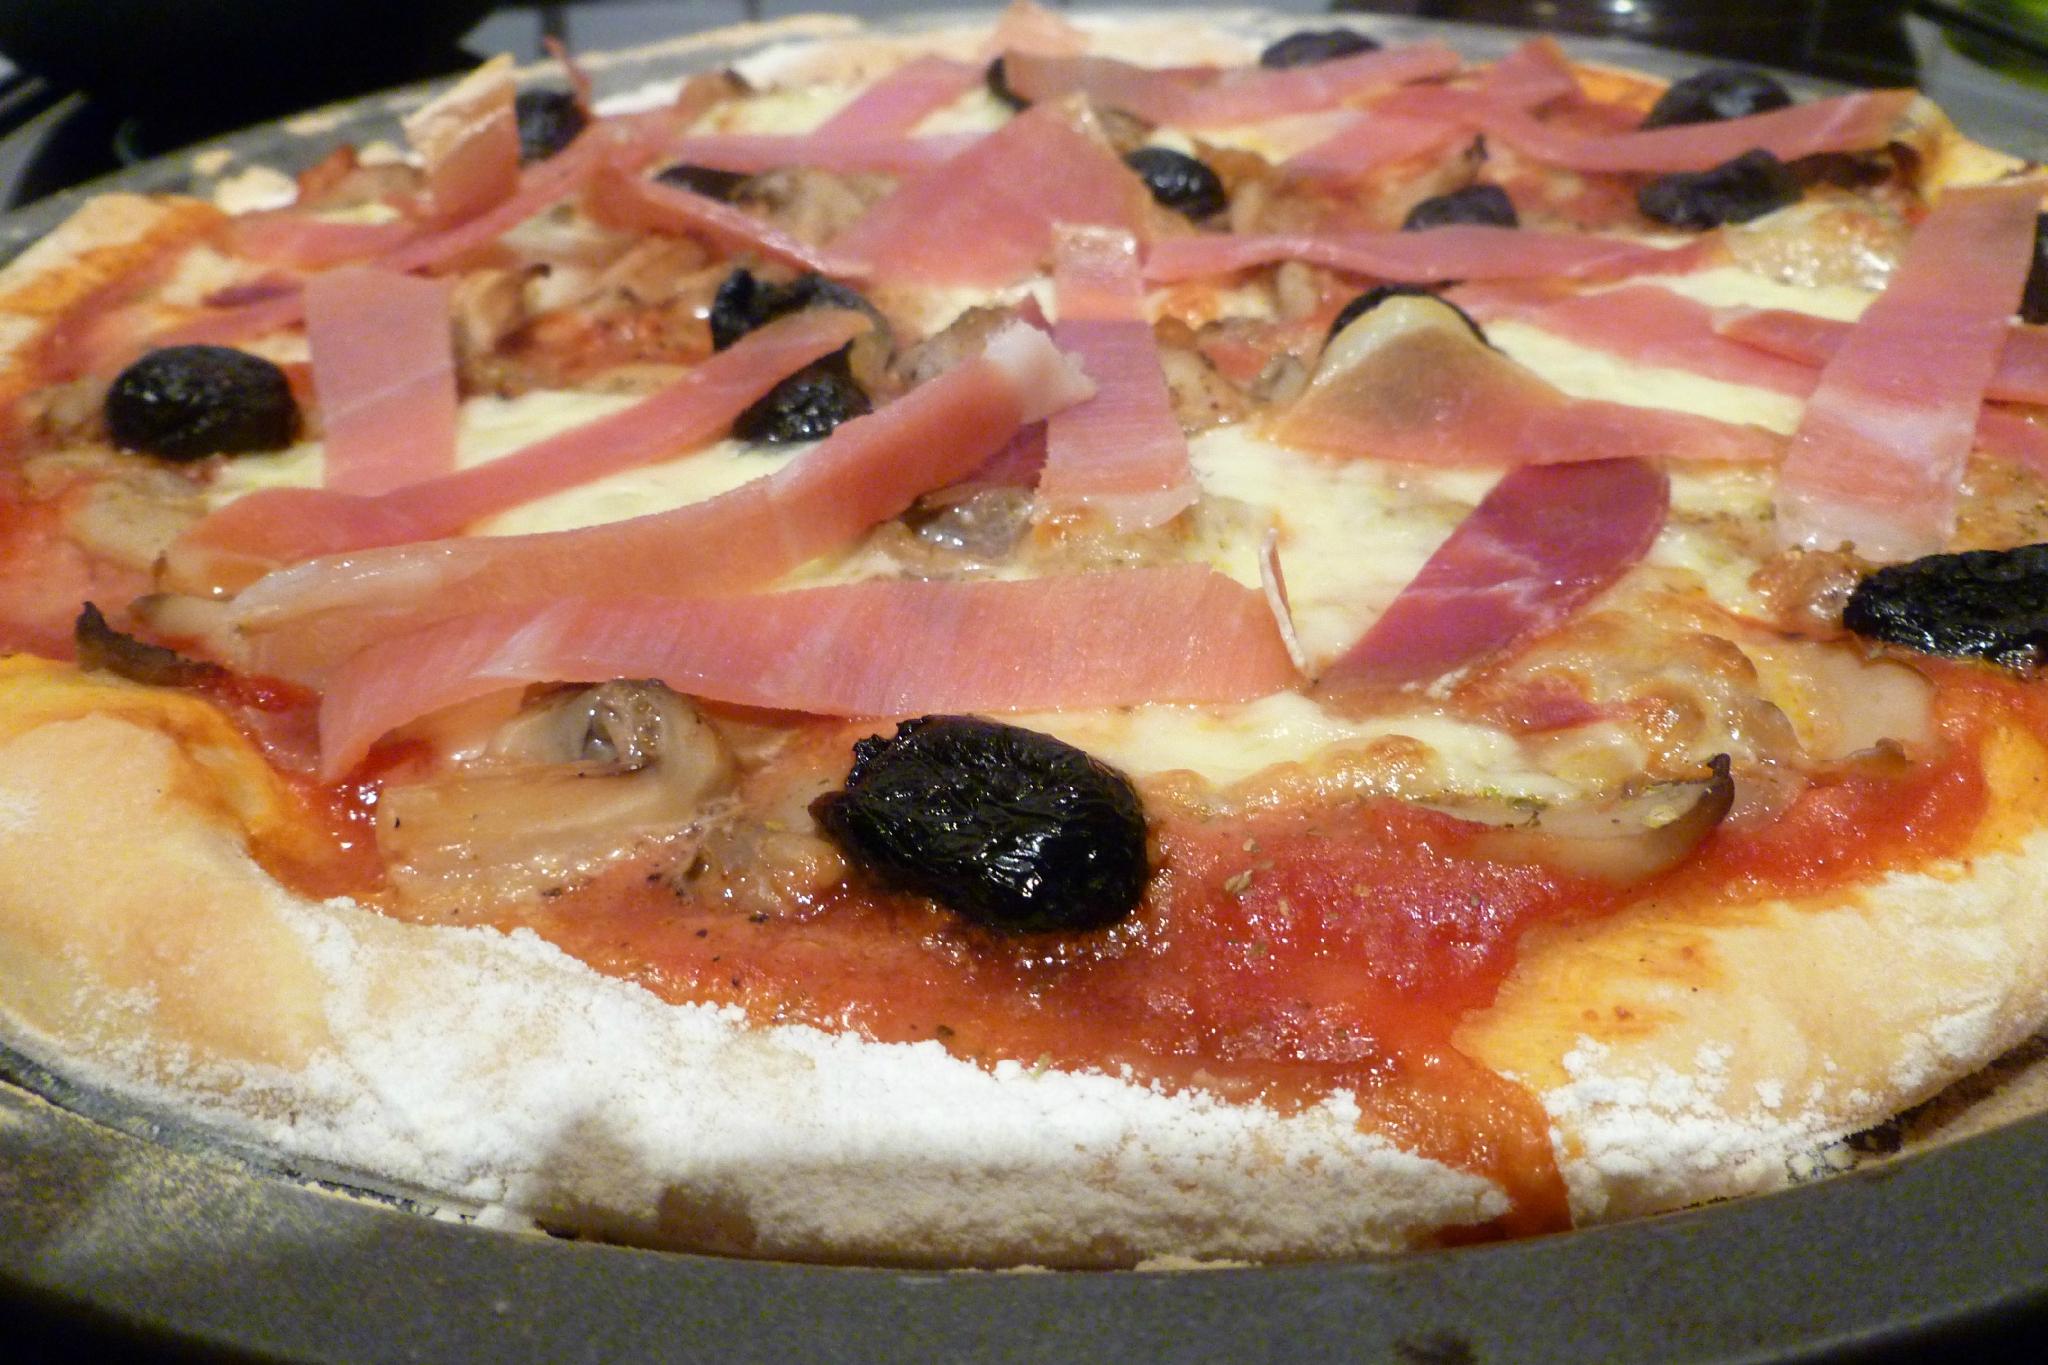 pizza champignon olives et jambon cru ah la. Black Bedroom Furniture Sets. Home Design Ideas